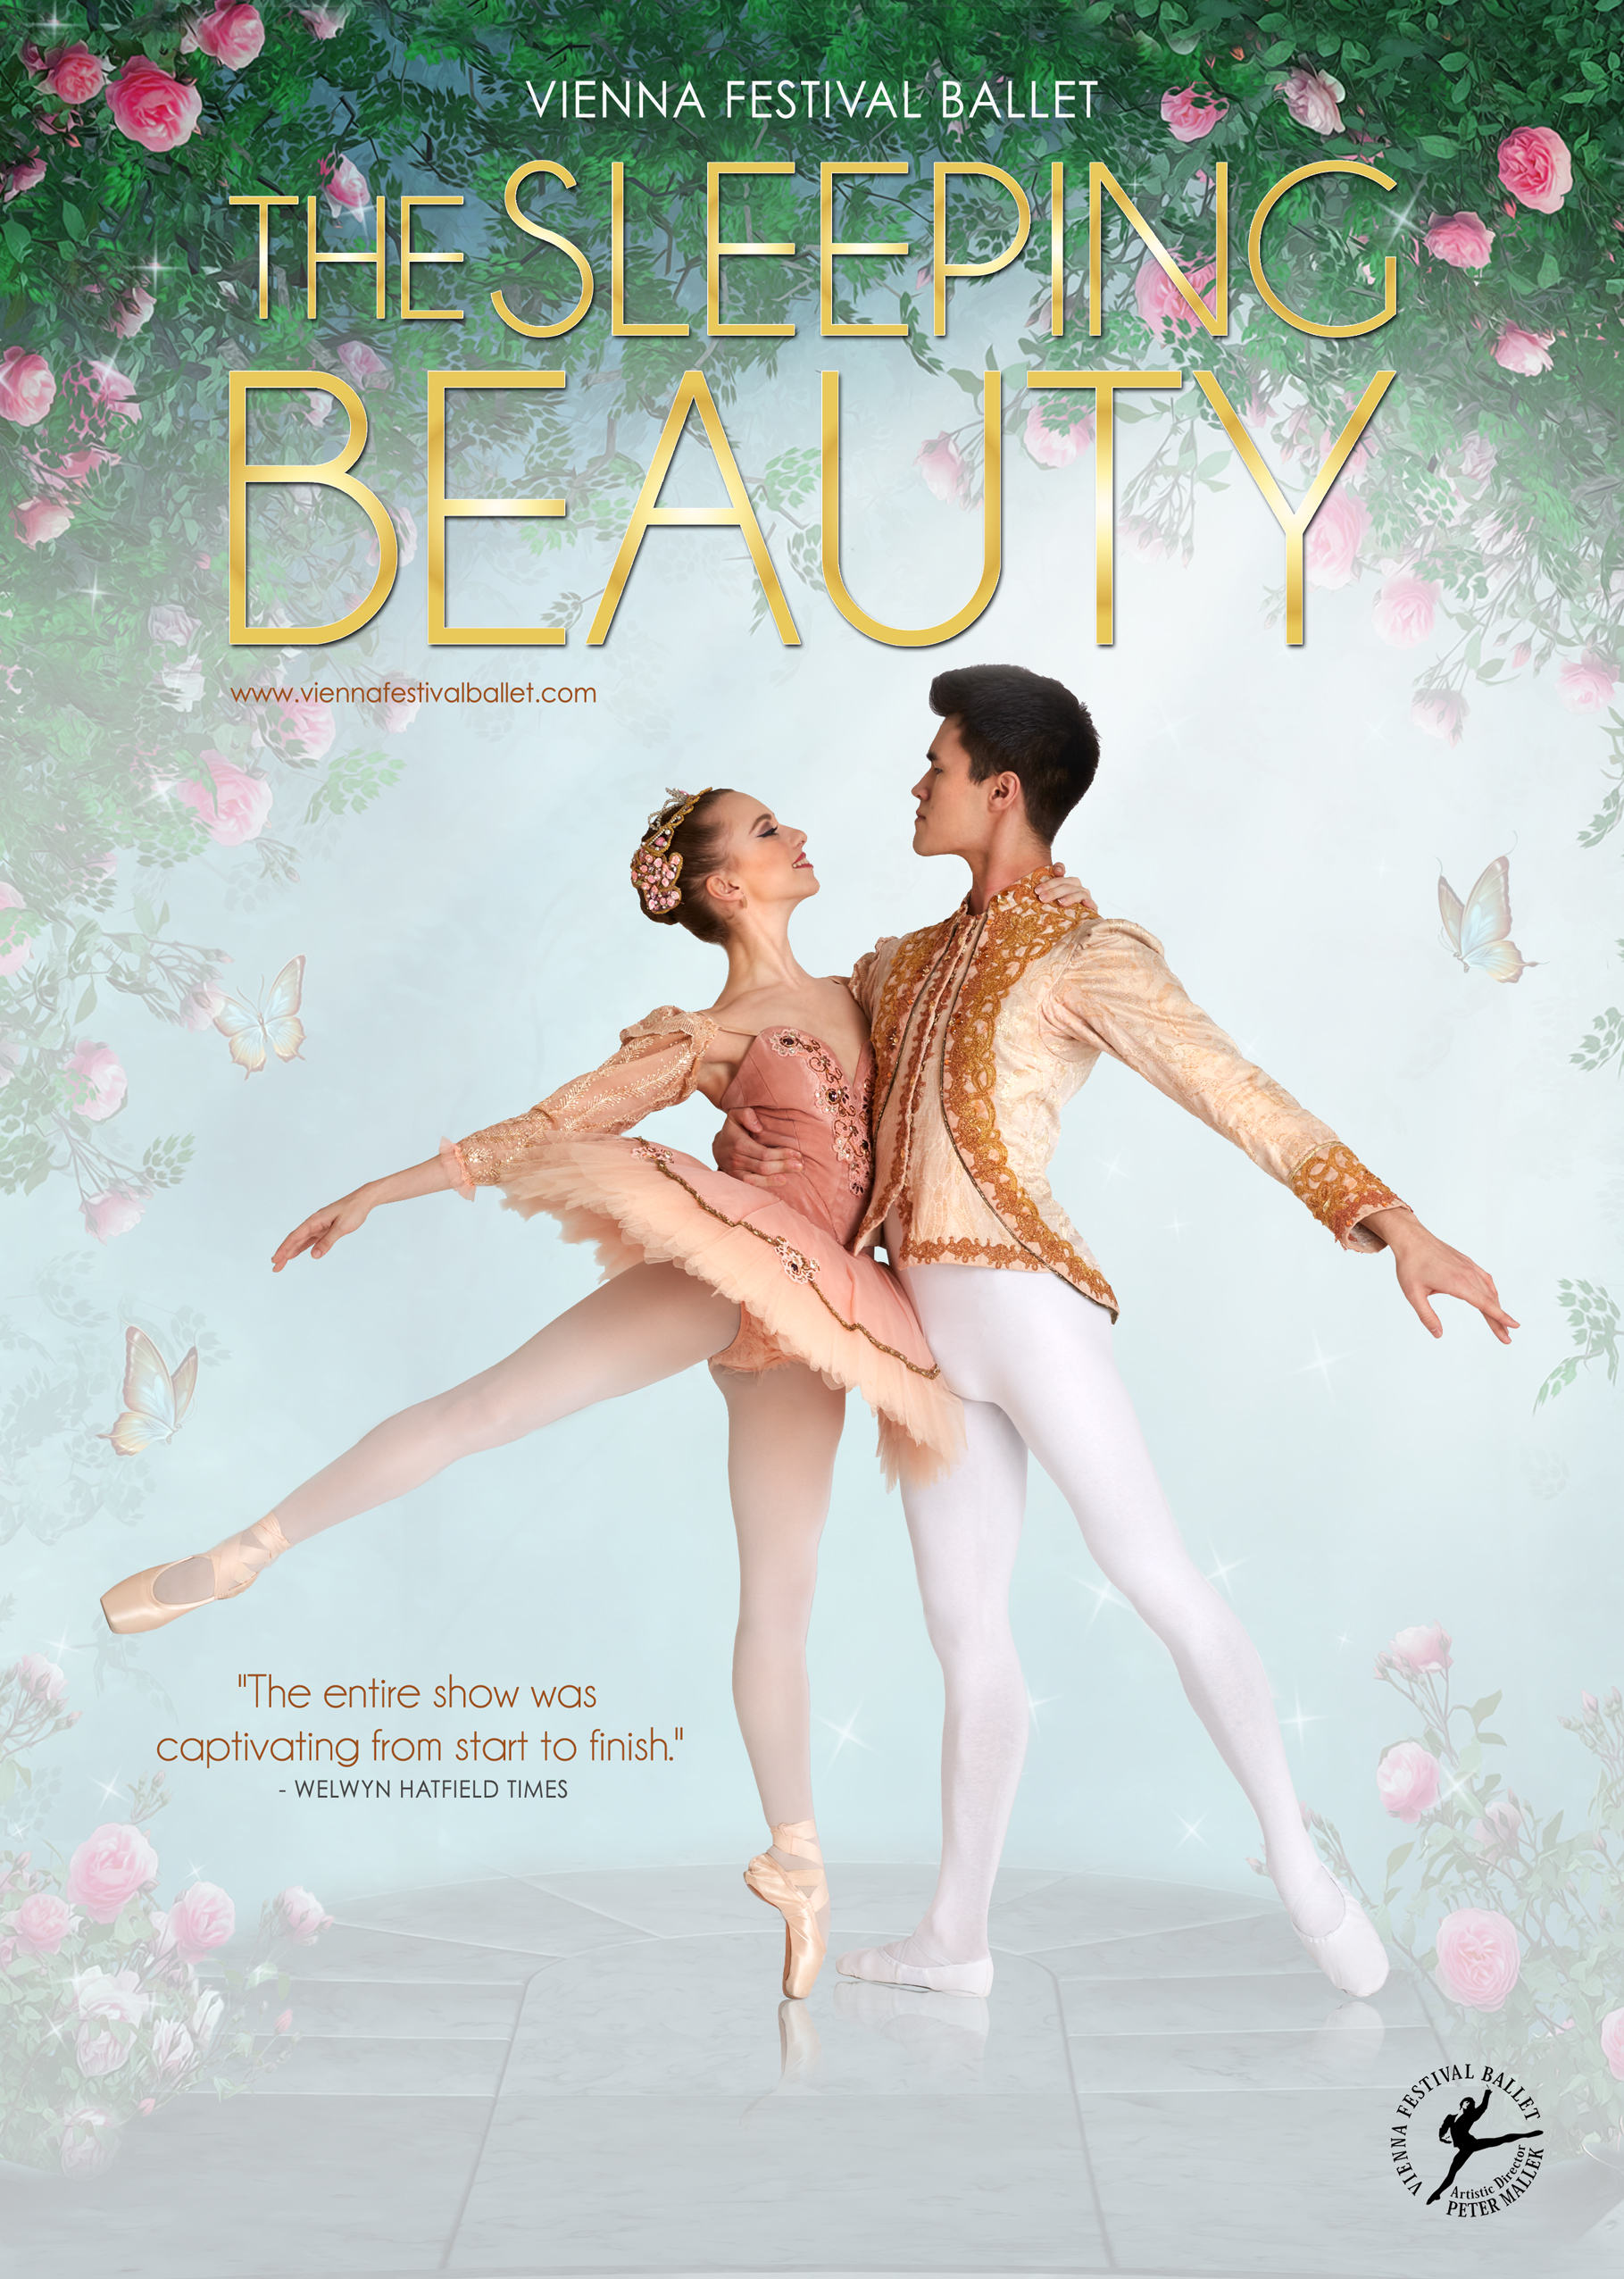 Vienna Festival Ballet Sleeping Beauty Poster